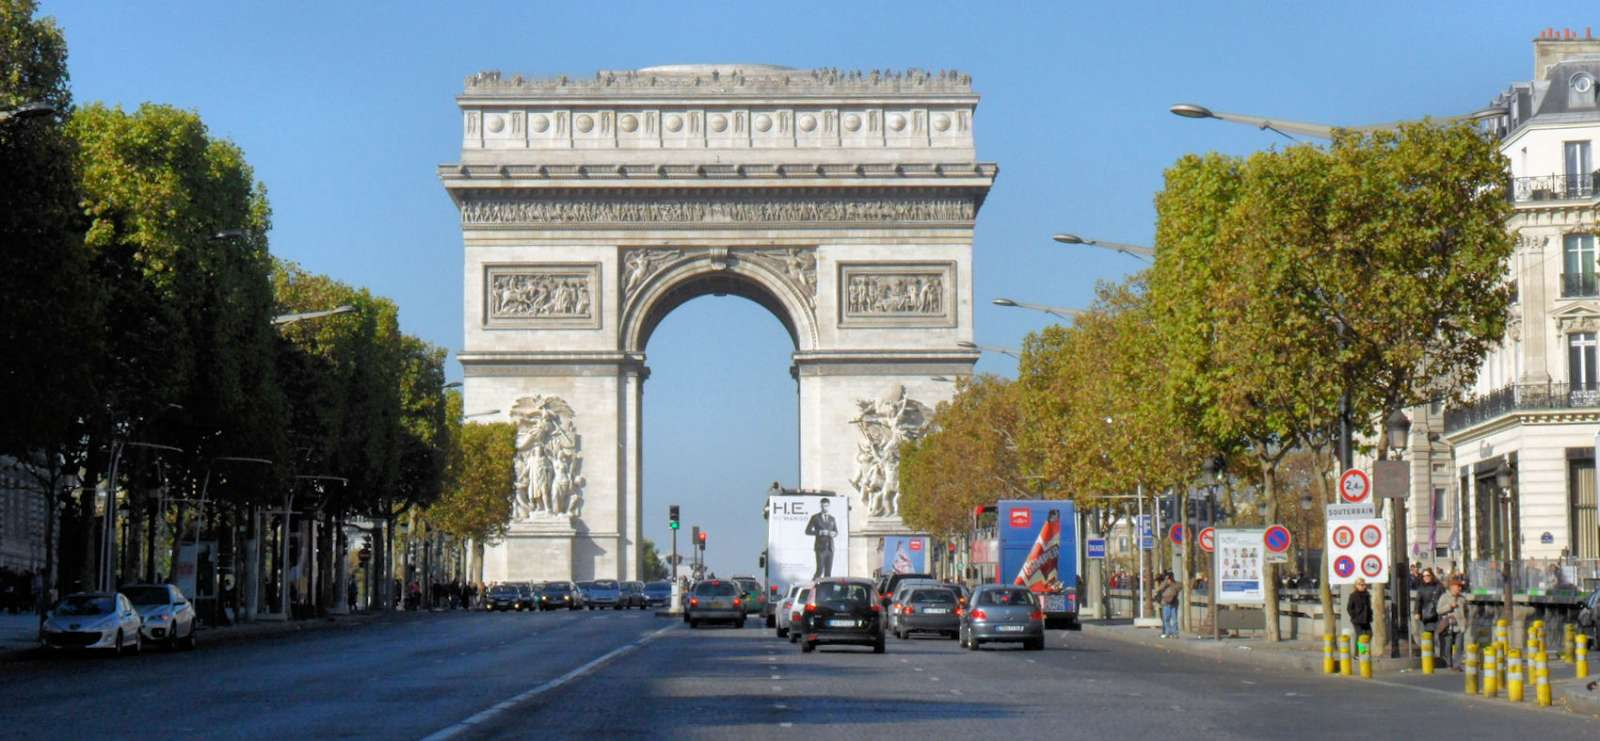 Napoleons triumfbuge for enden af Les Champs-Elysées